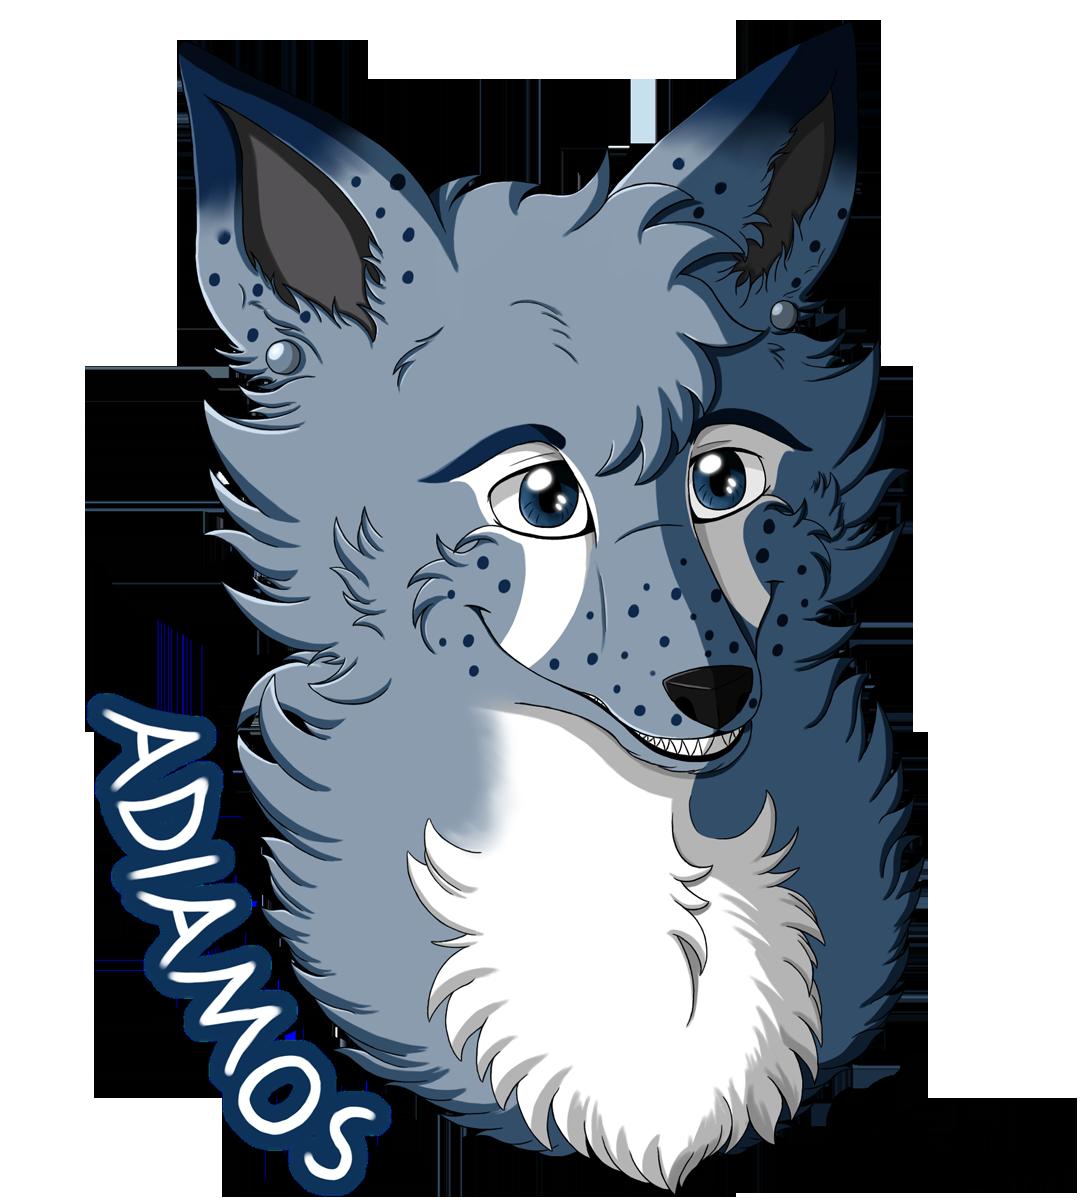 Adiamos - Commission by Beagon